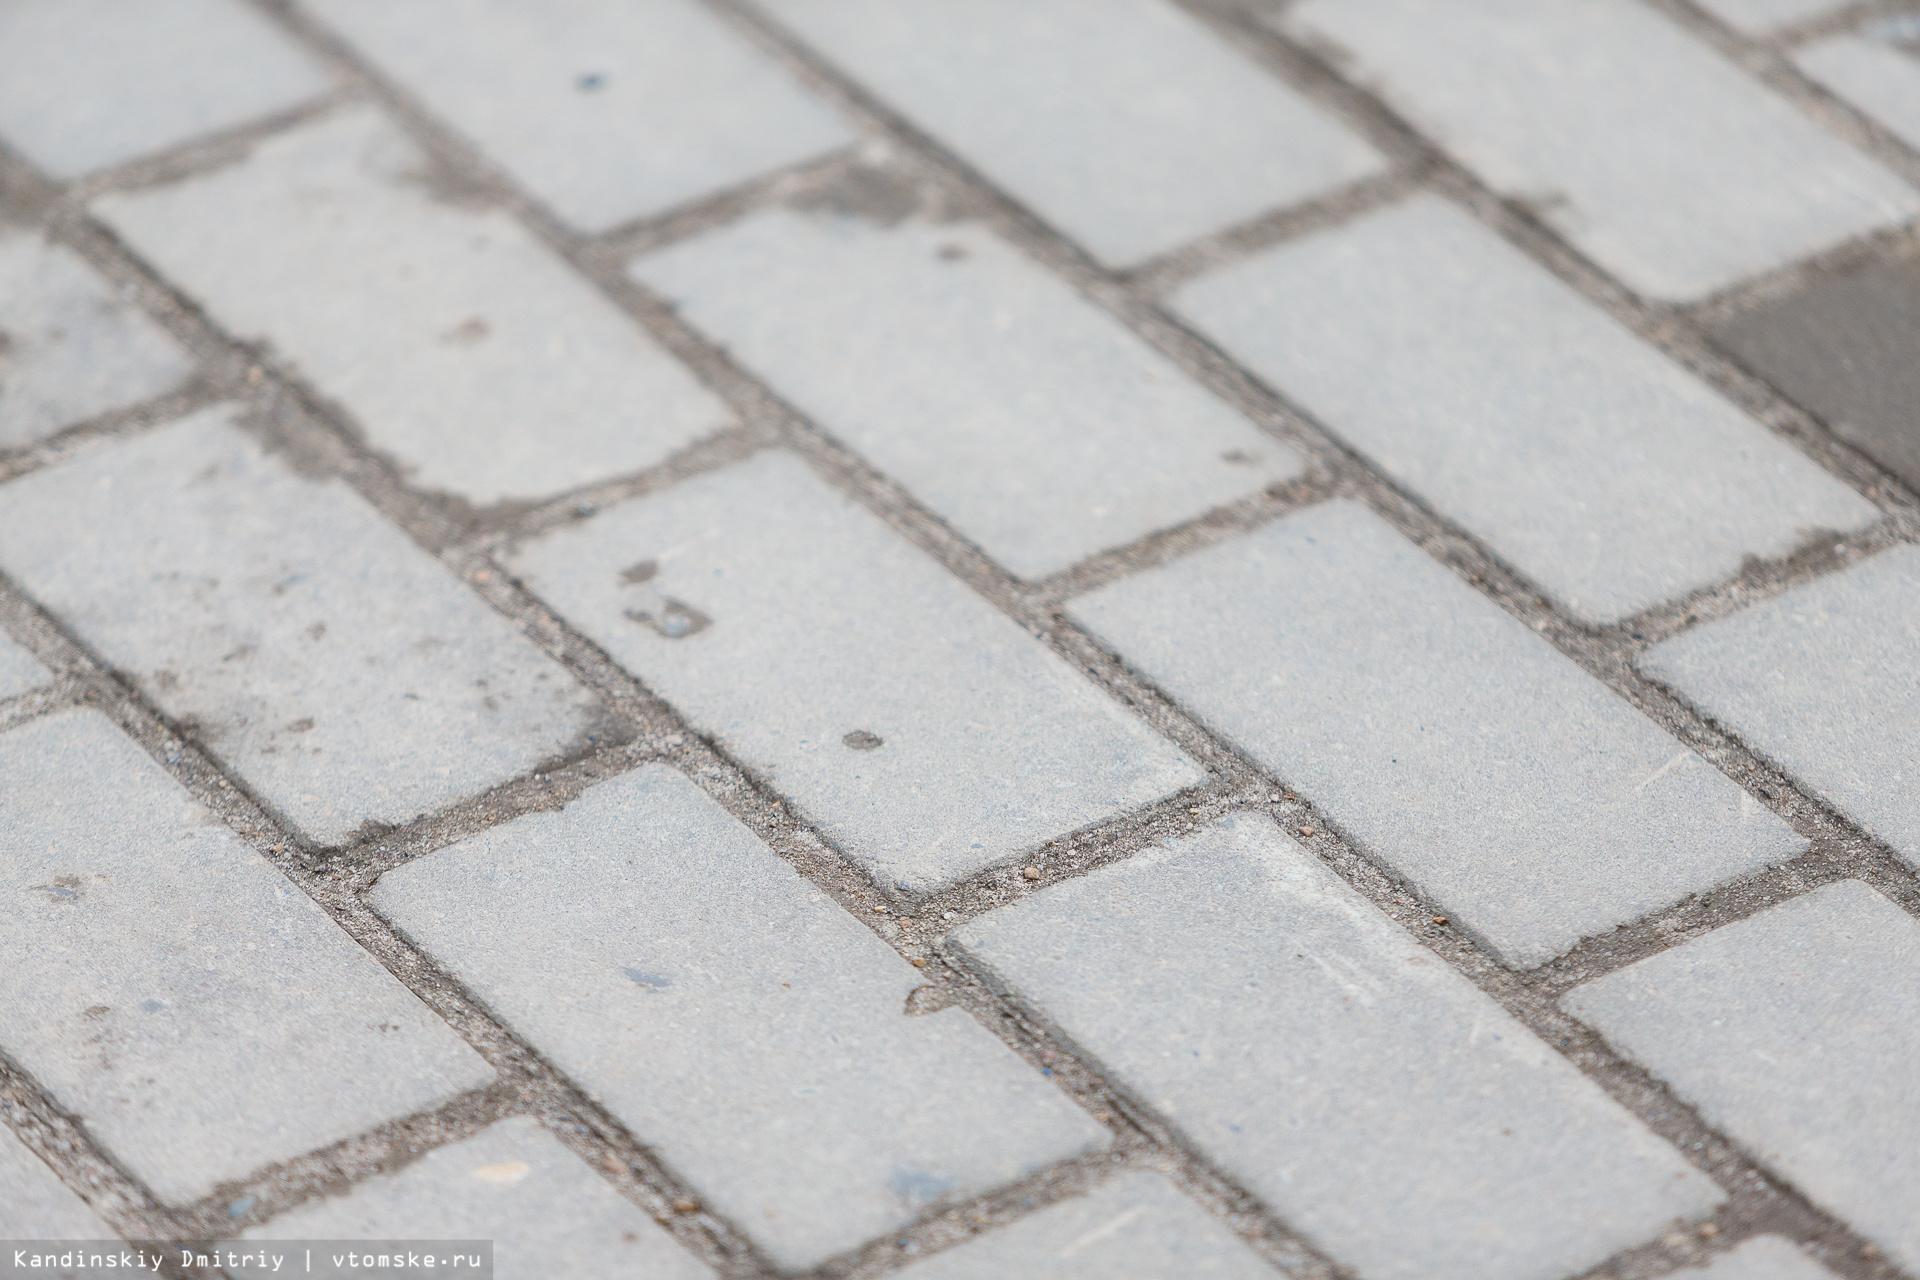 В 2018г на ремонт тротуаров в Томске направят 40 млн руб